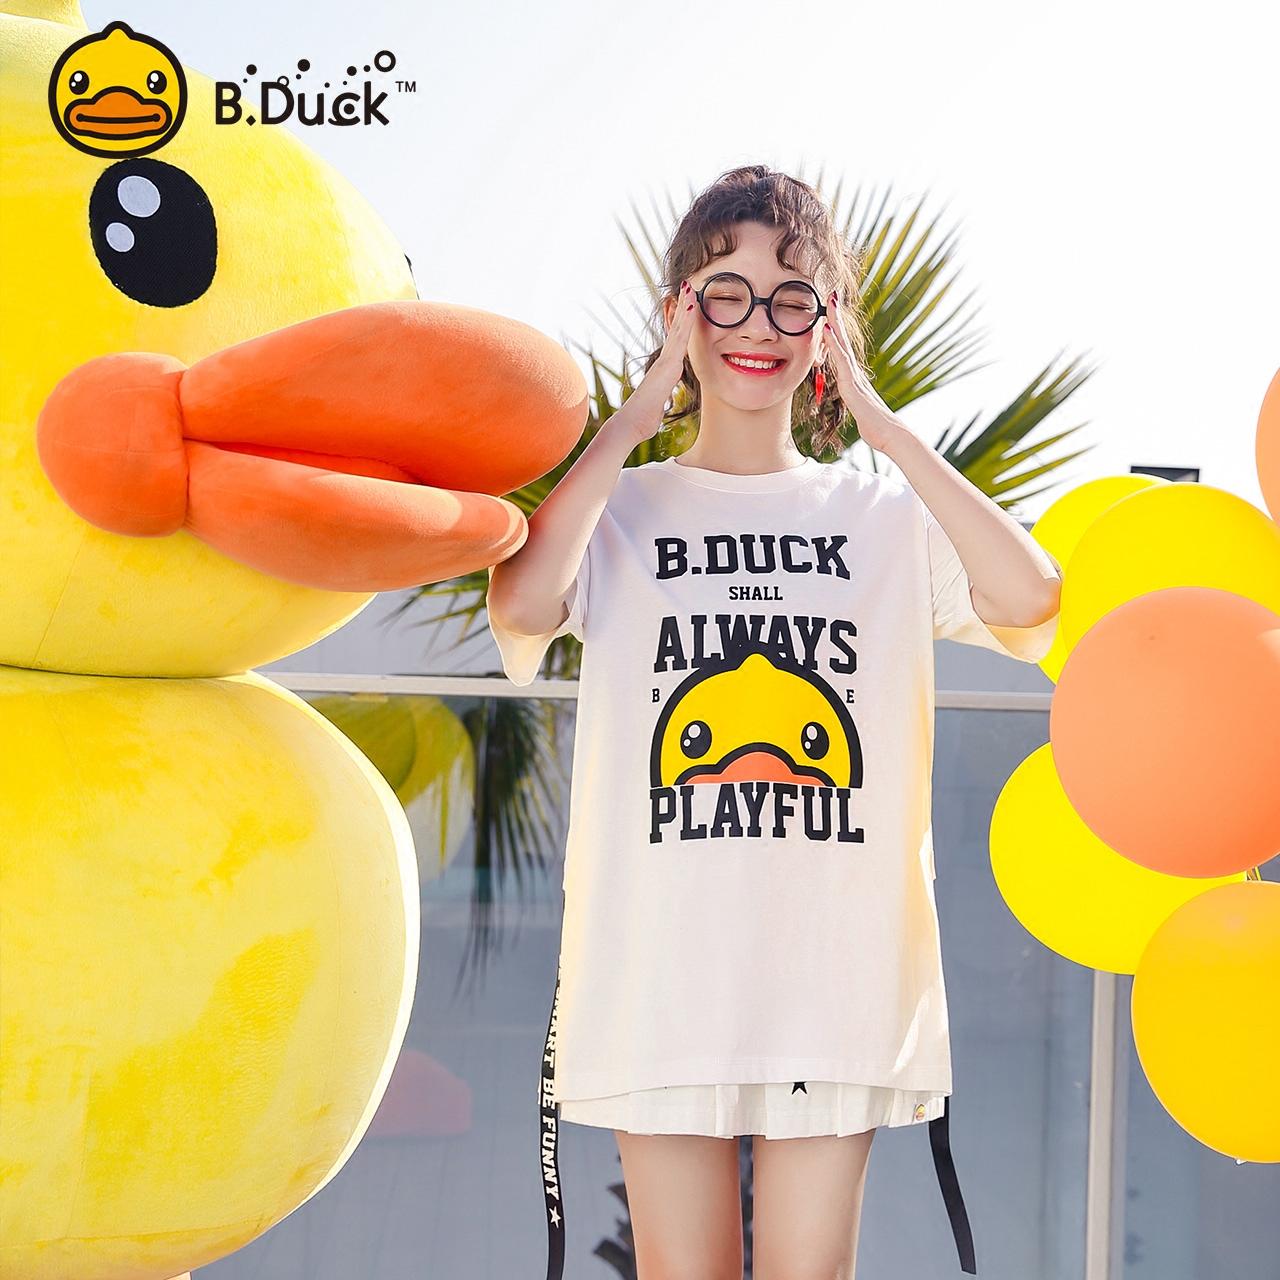 B.DuckBW系列小黄鸭女装2018夏季新款白色t恤印花短袖宽松上衣